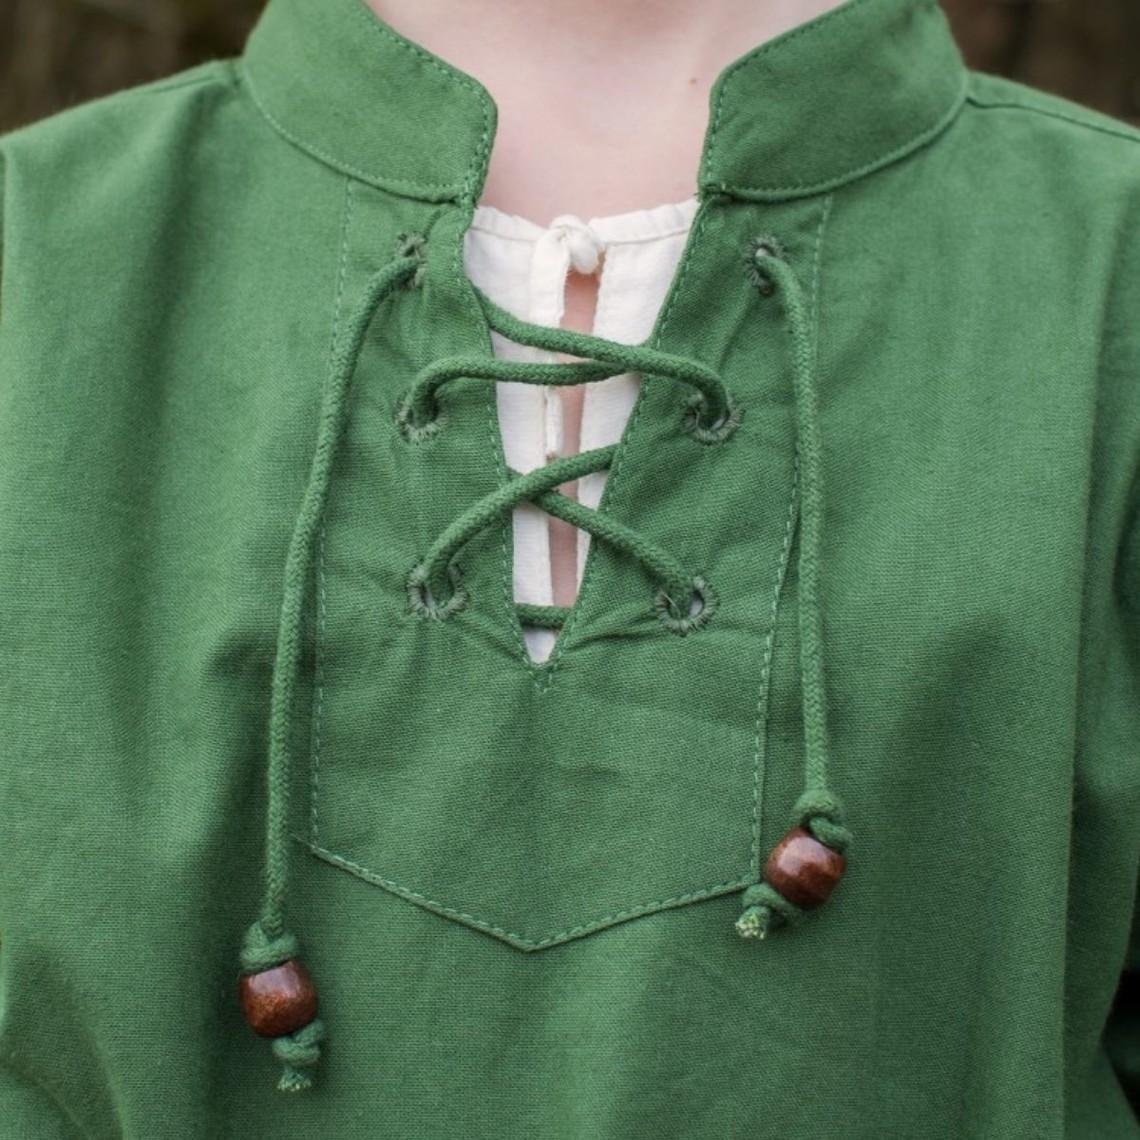 pirate enfants chemise, vert